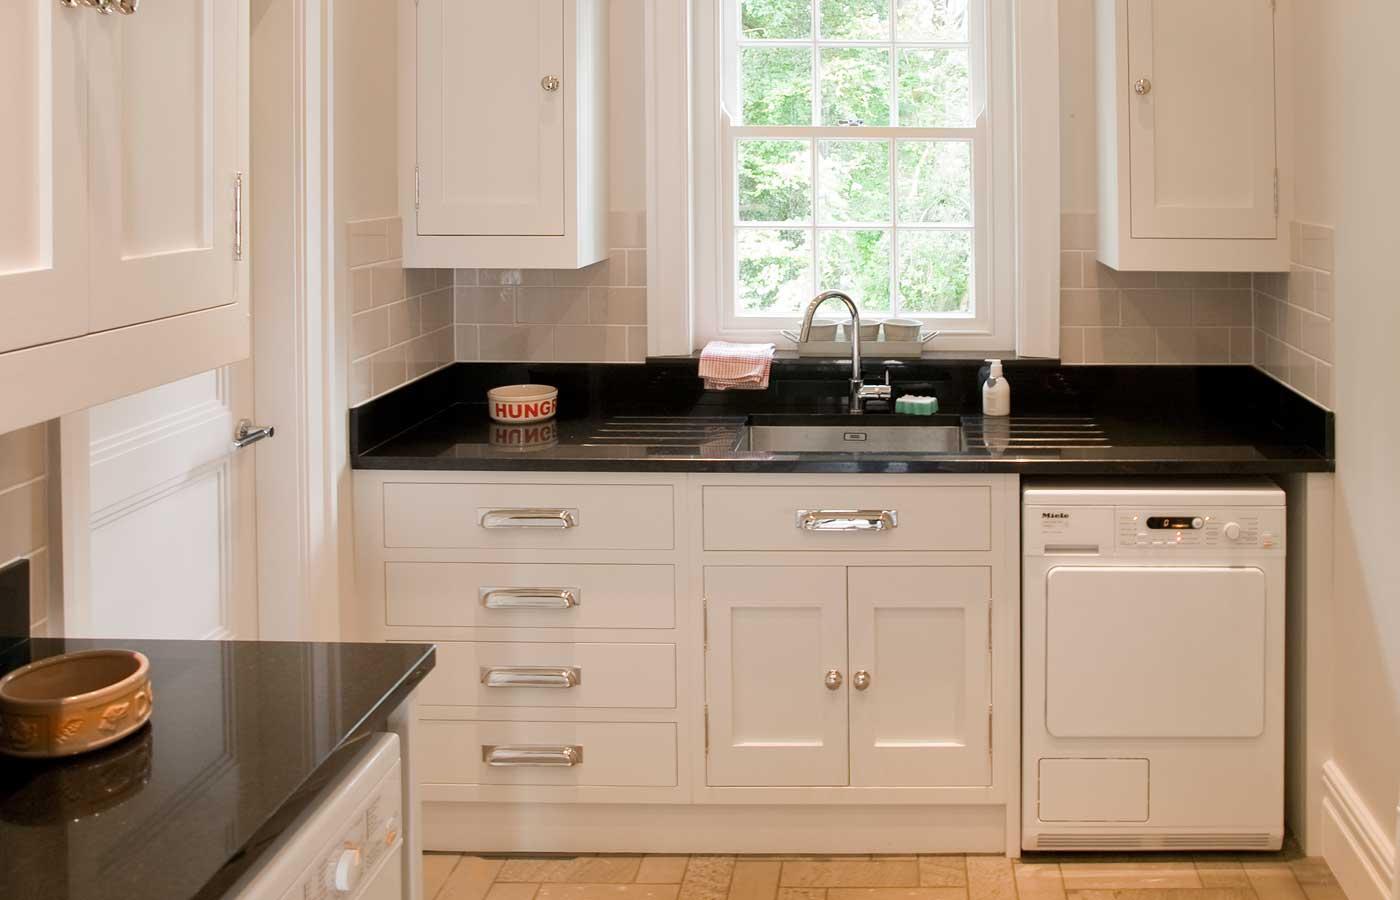 Slate Floor Kitchens Slate Worktops Slate Floors Natural Stone Kitchens By Paul